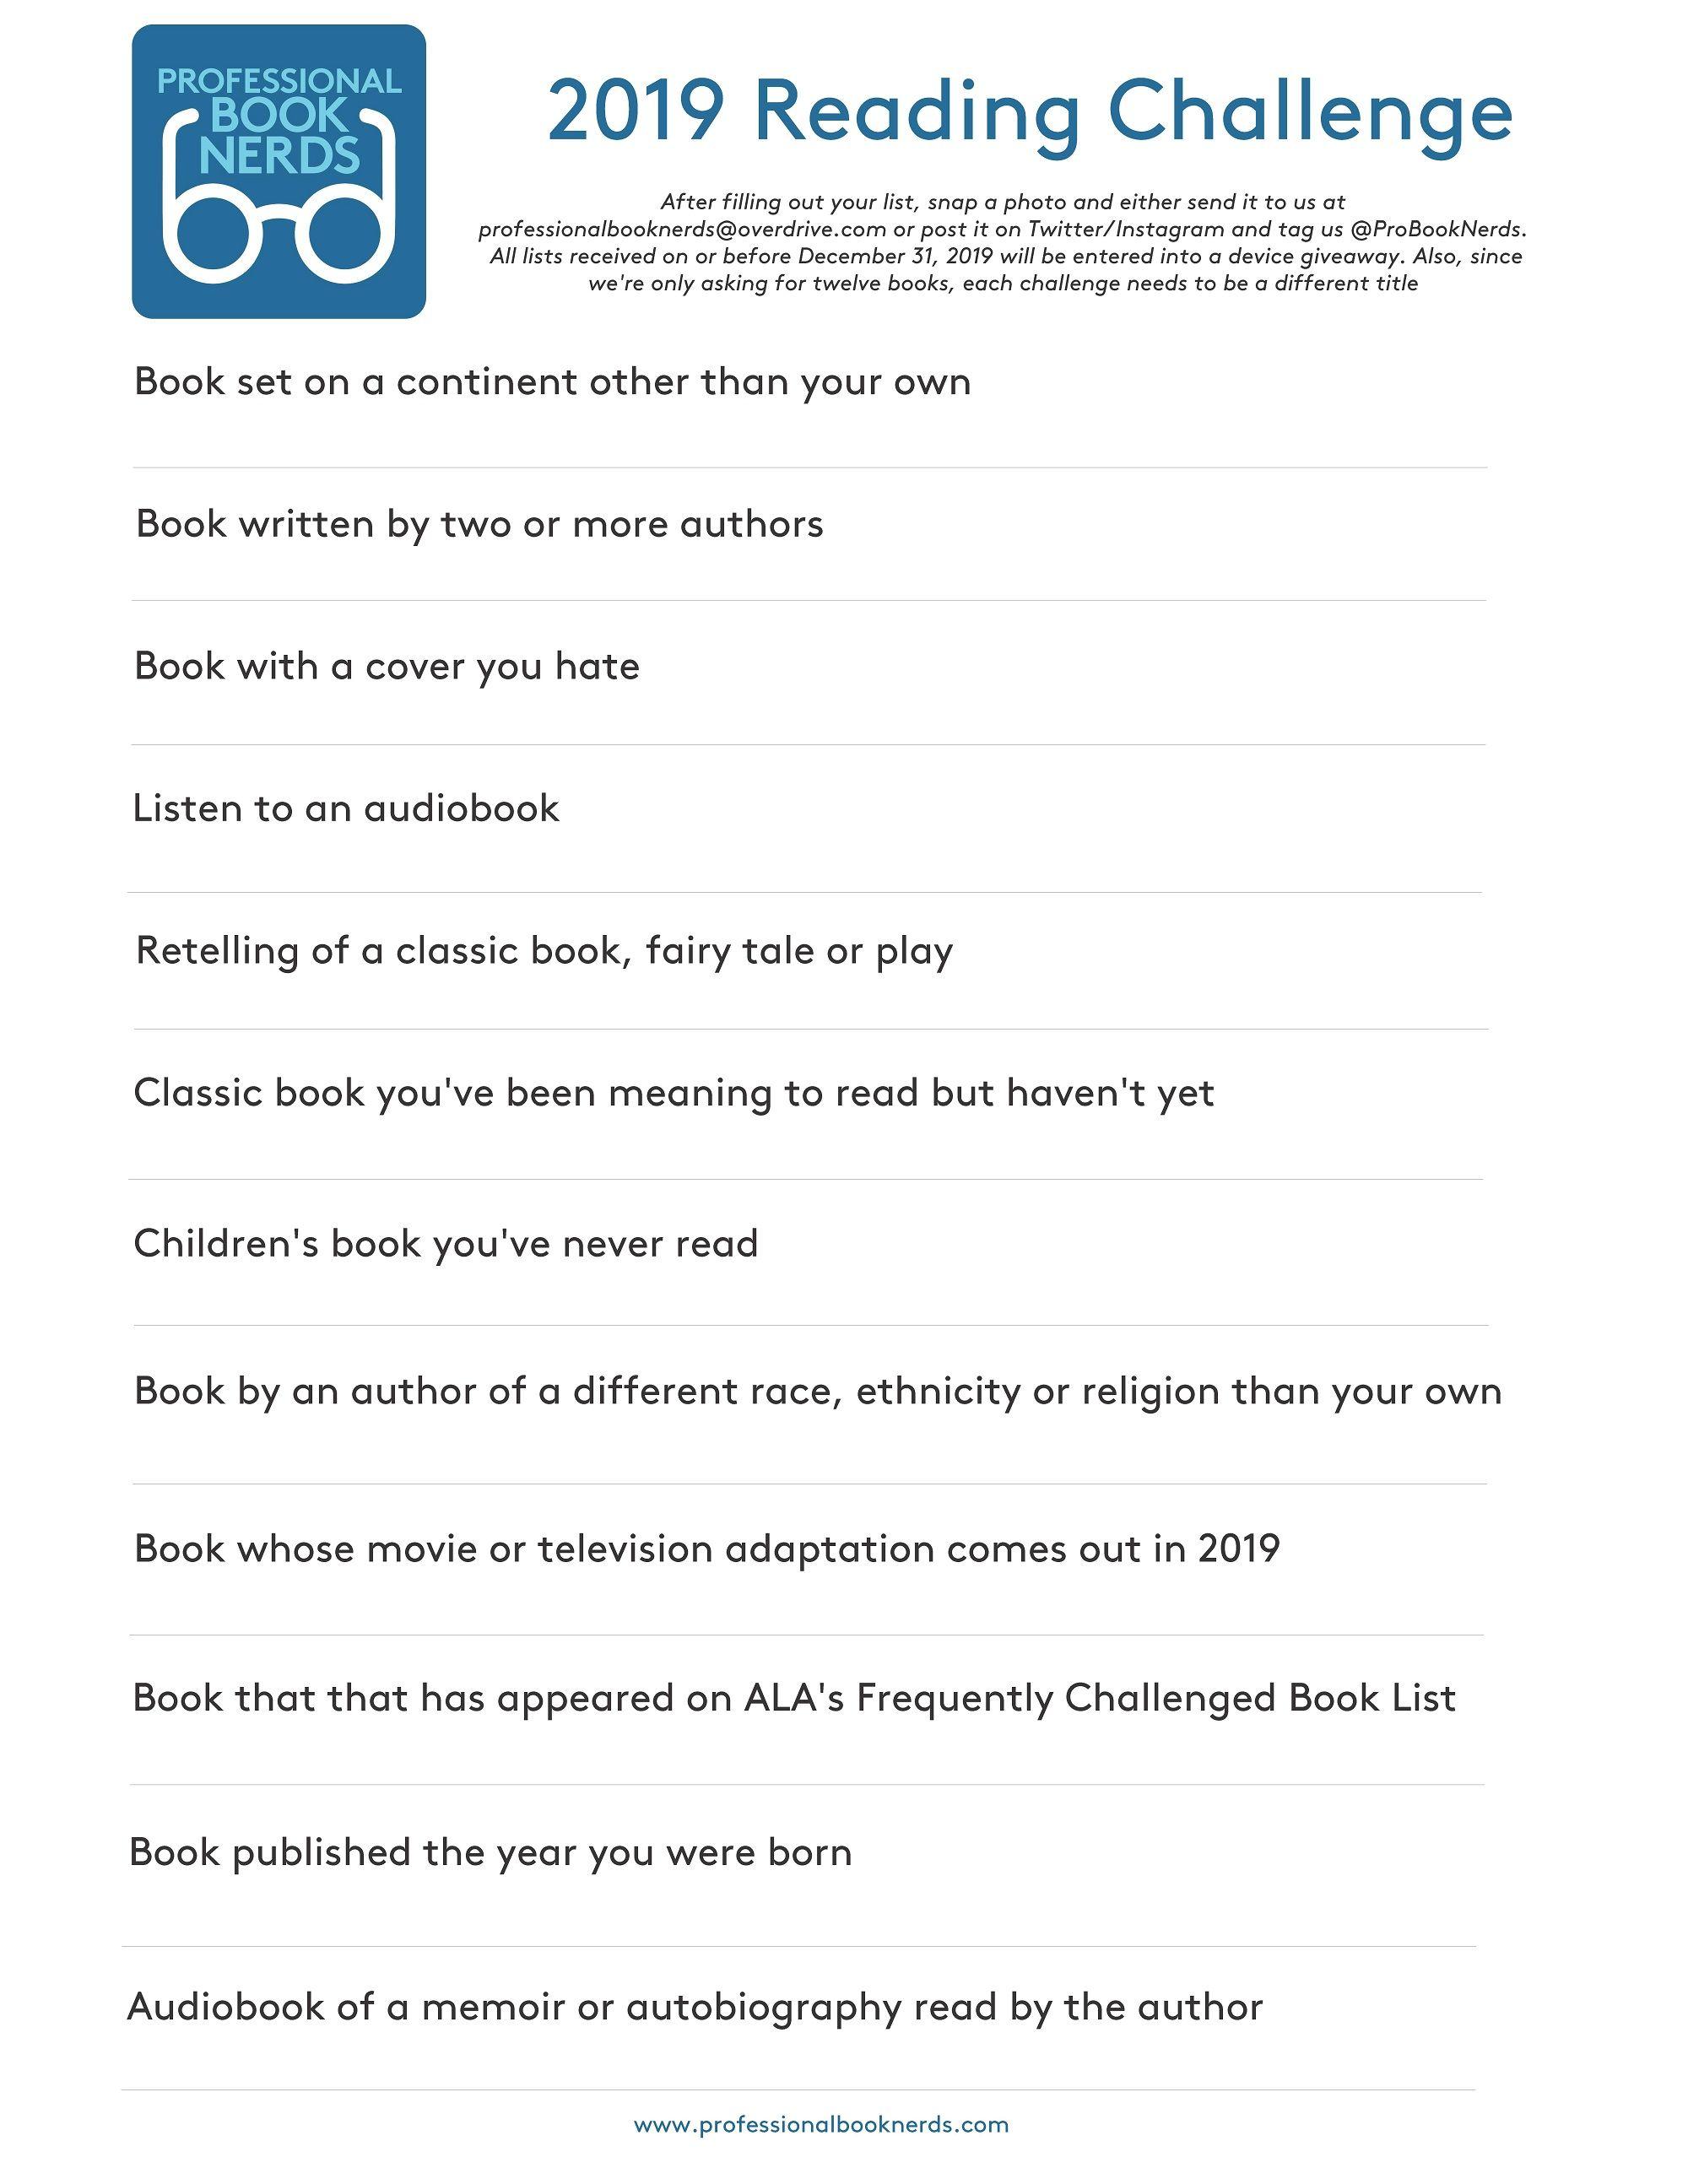 professionalbooknerds.com | Books Worth Reading | Reading challenge ...